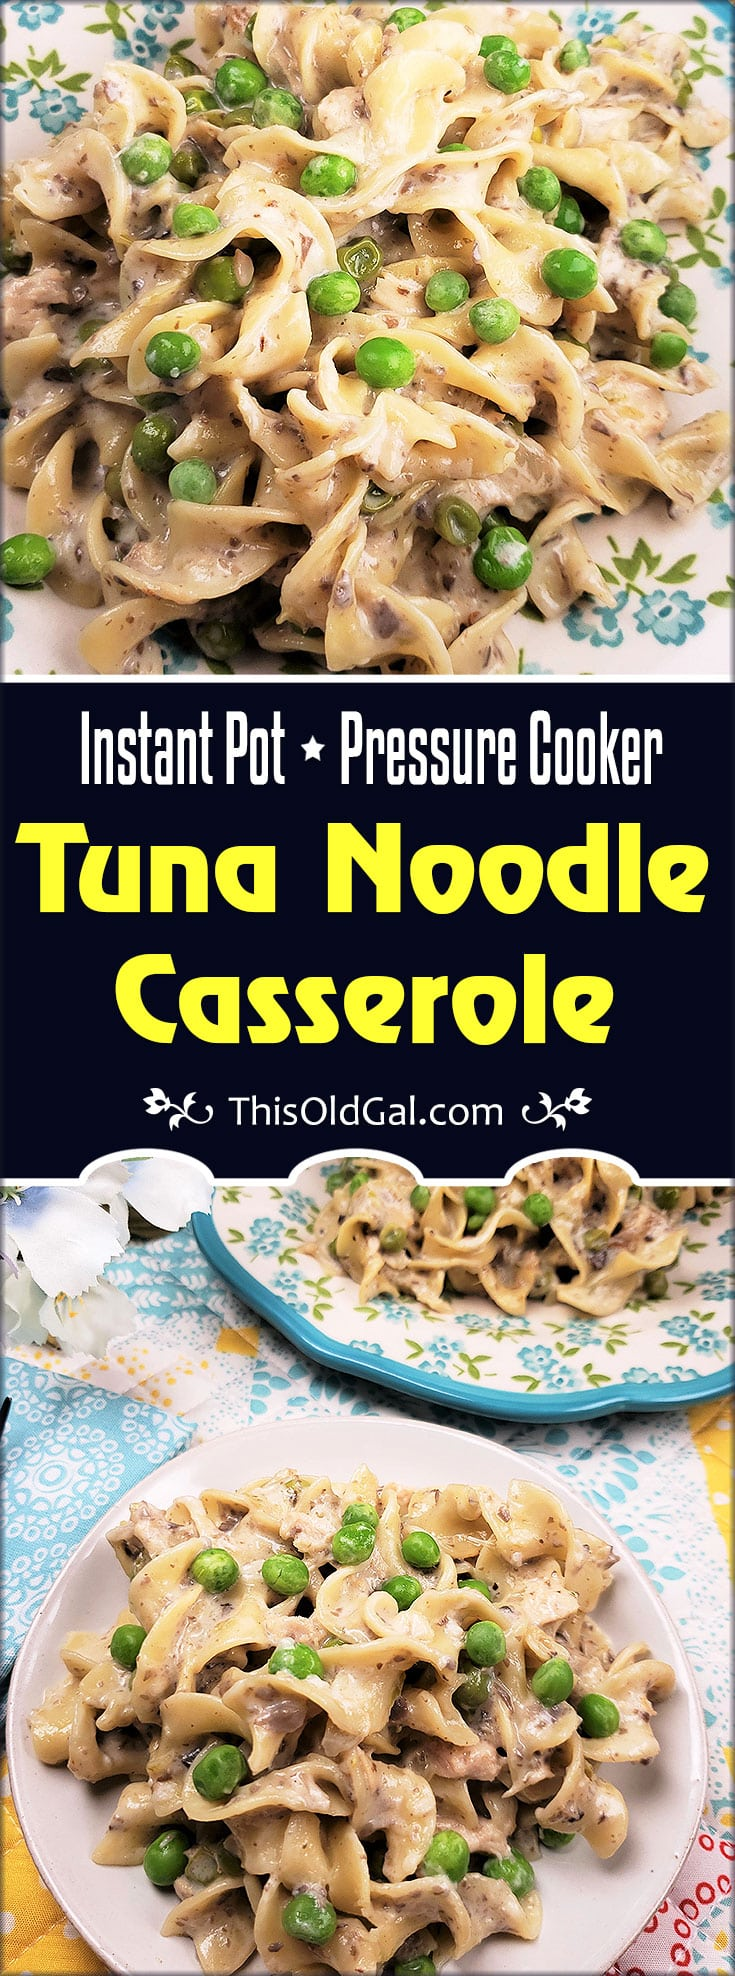 Instant Pot Pressure Cooker Tuna Noodle Casserole